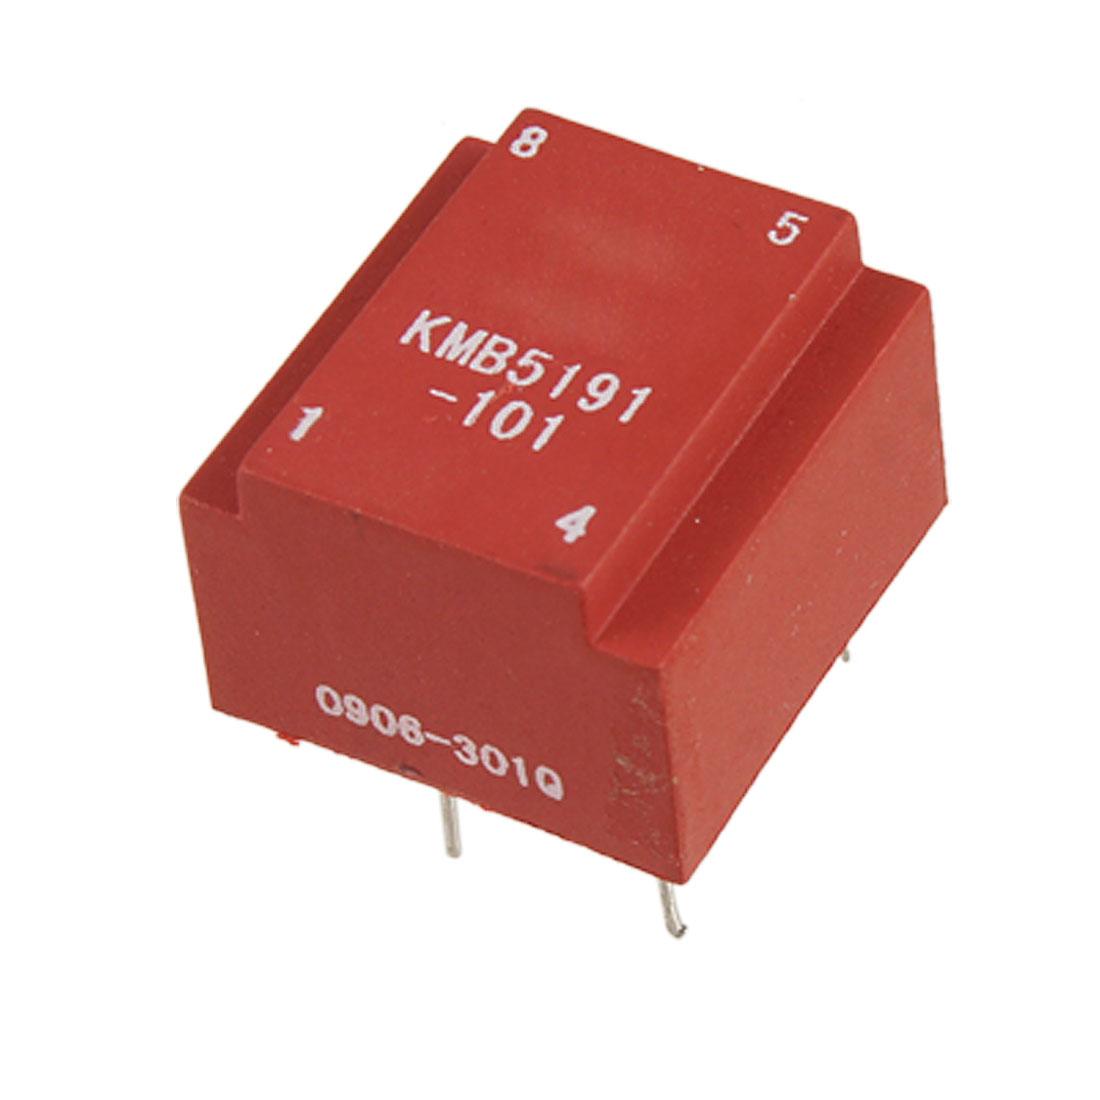 KMB5191-101 High Frequency Signal Isolation Encapsulated Thyristors Transformer 1VA